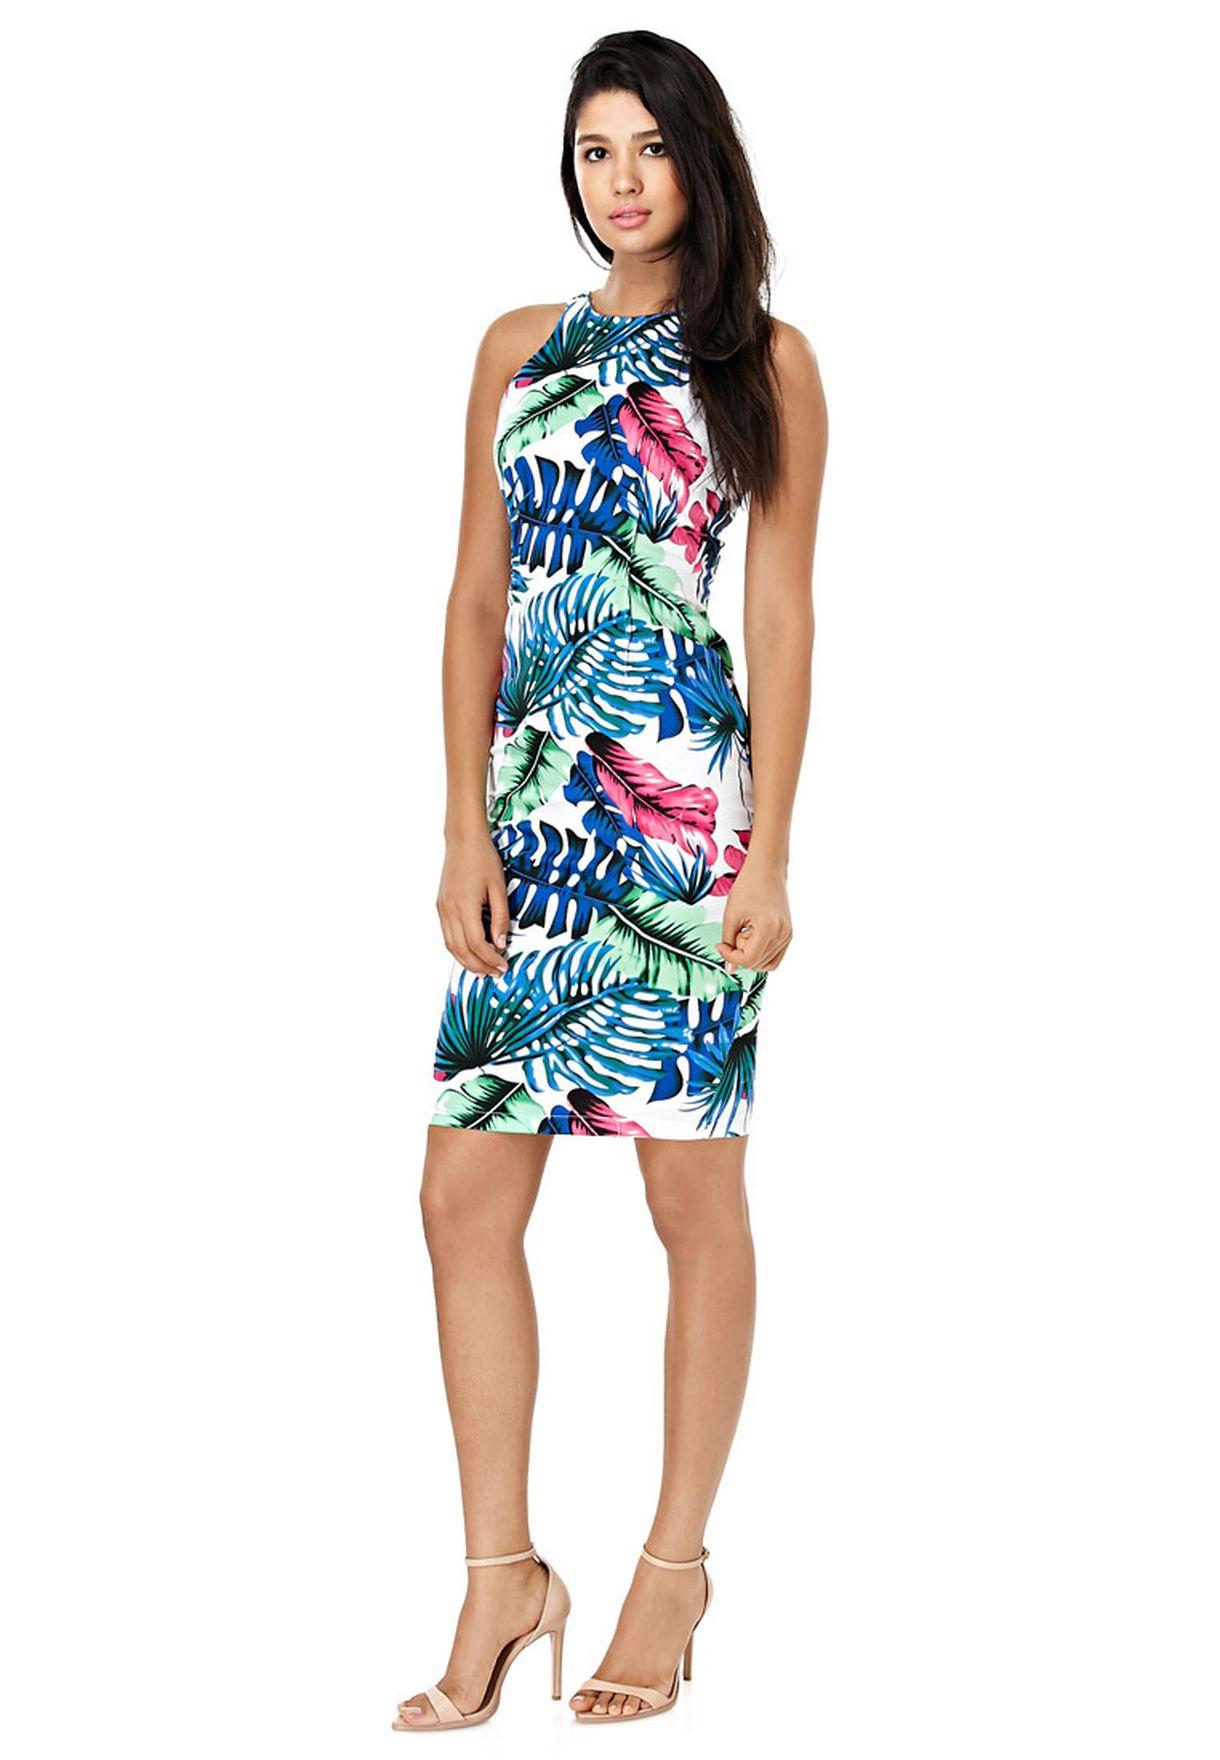 c3393ccdaf207 Shop Ax paris multicolor Floral Midi Dress for Women in Oman ...